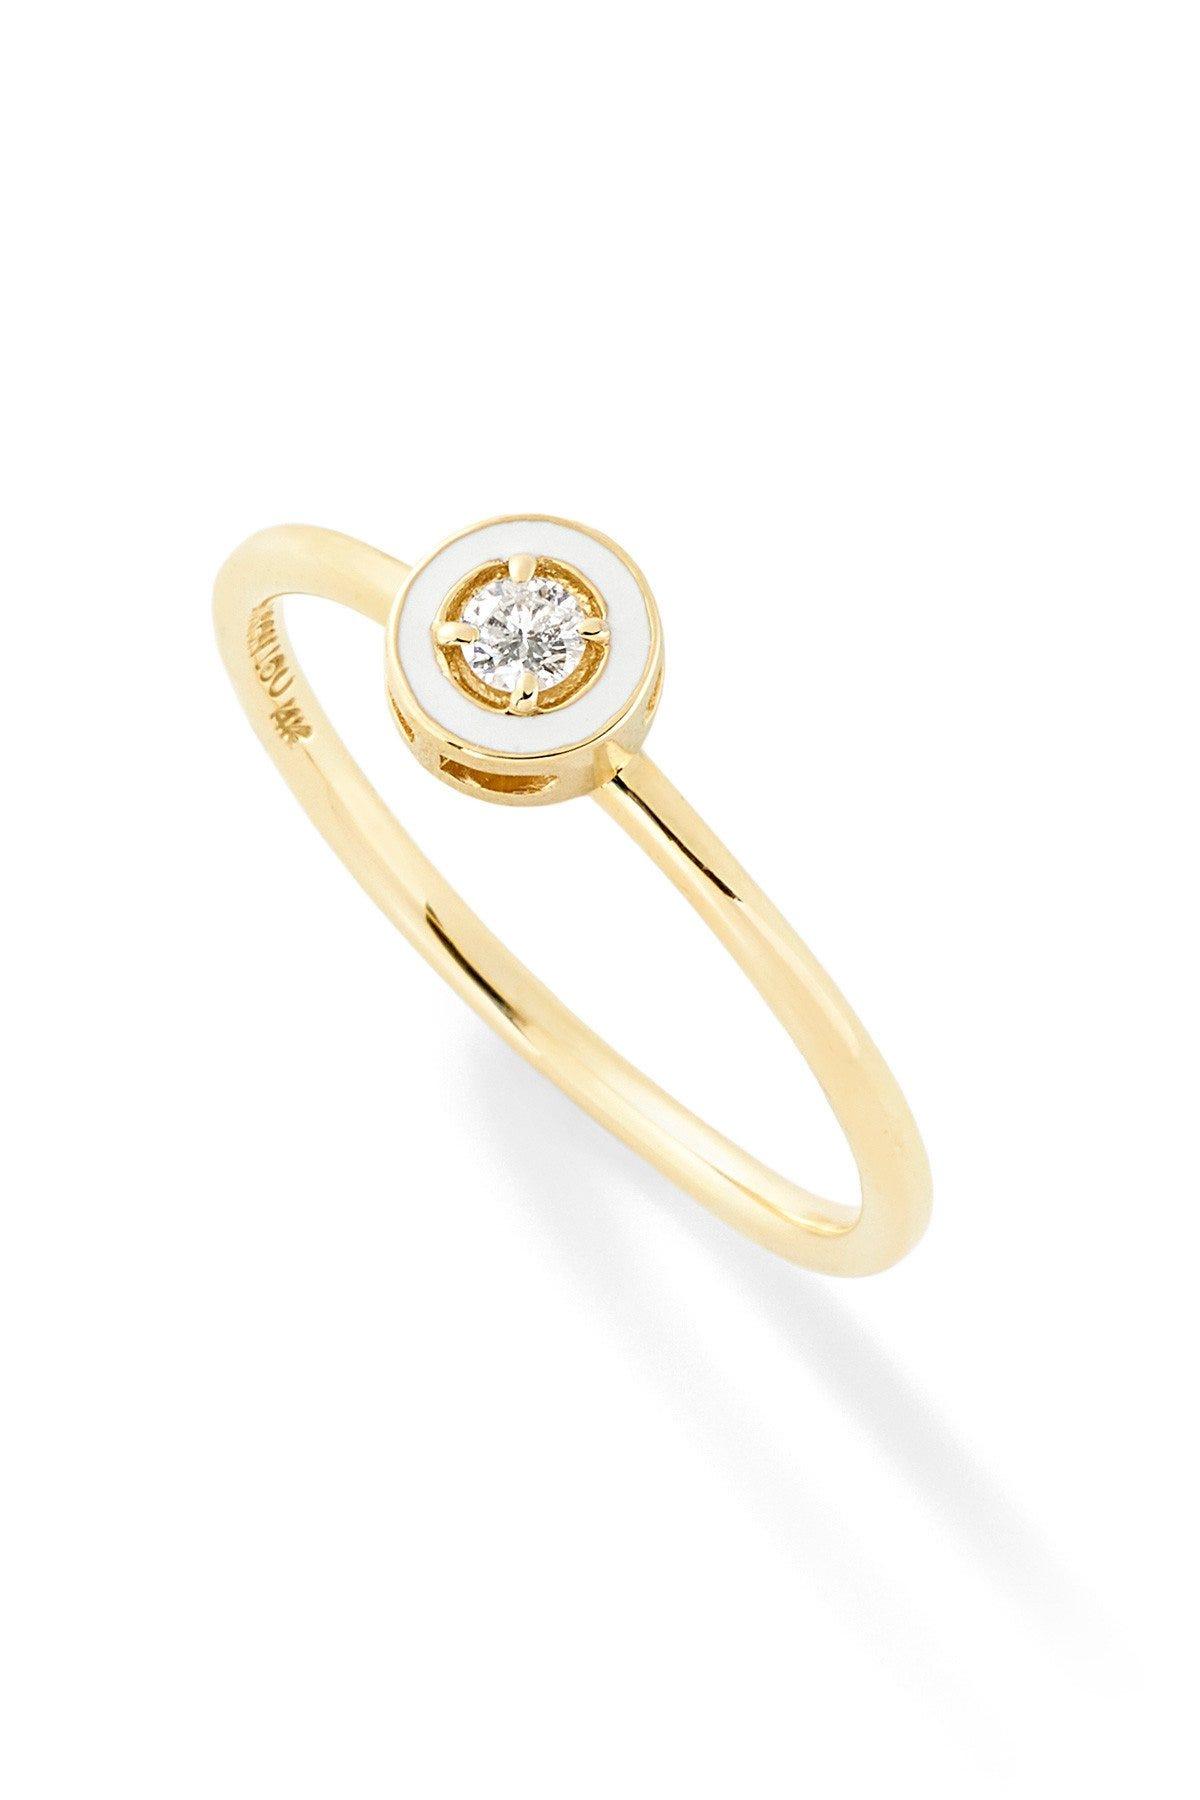 Adorable Minimalist Engagement Rings Design Bands Minimalist Engagement Ring Designers Minimalist Engagement Rings wedding rings Minimalist Engagement Rings